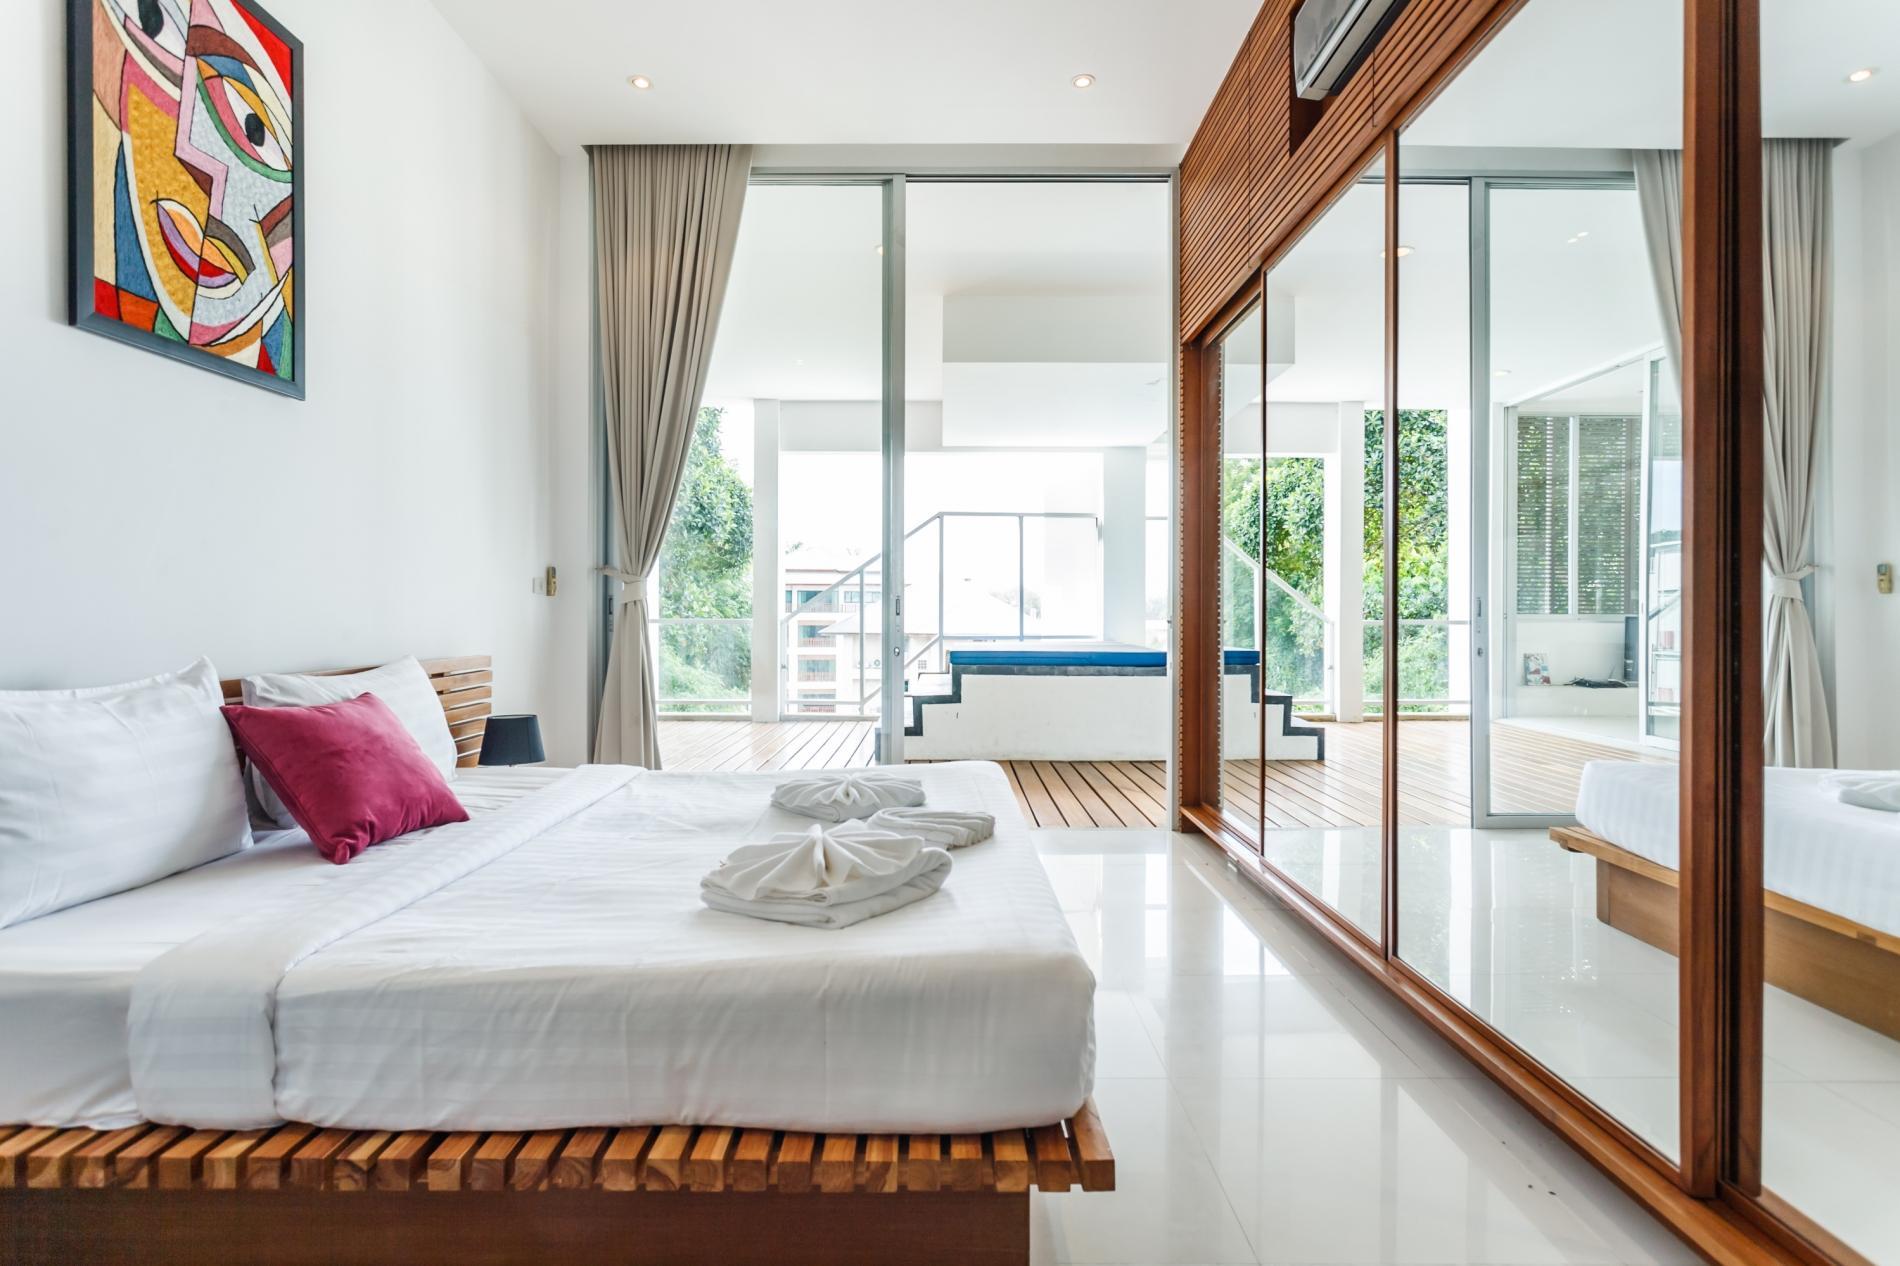 Apartment The Quarter 301 - Luxury Surin 3 bedroom apartment private pool photo 20176526